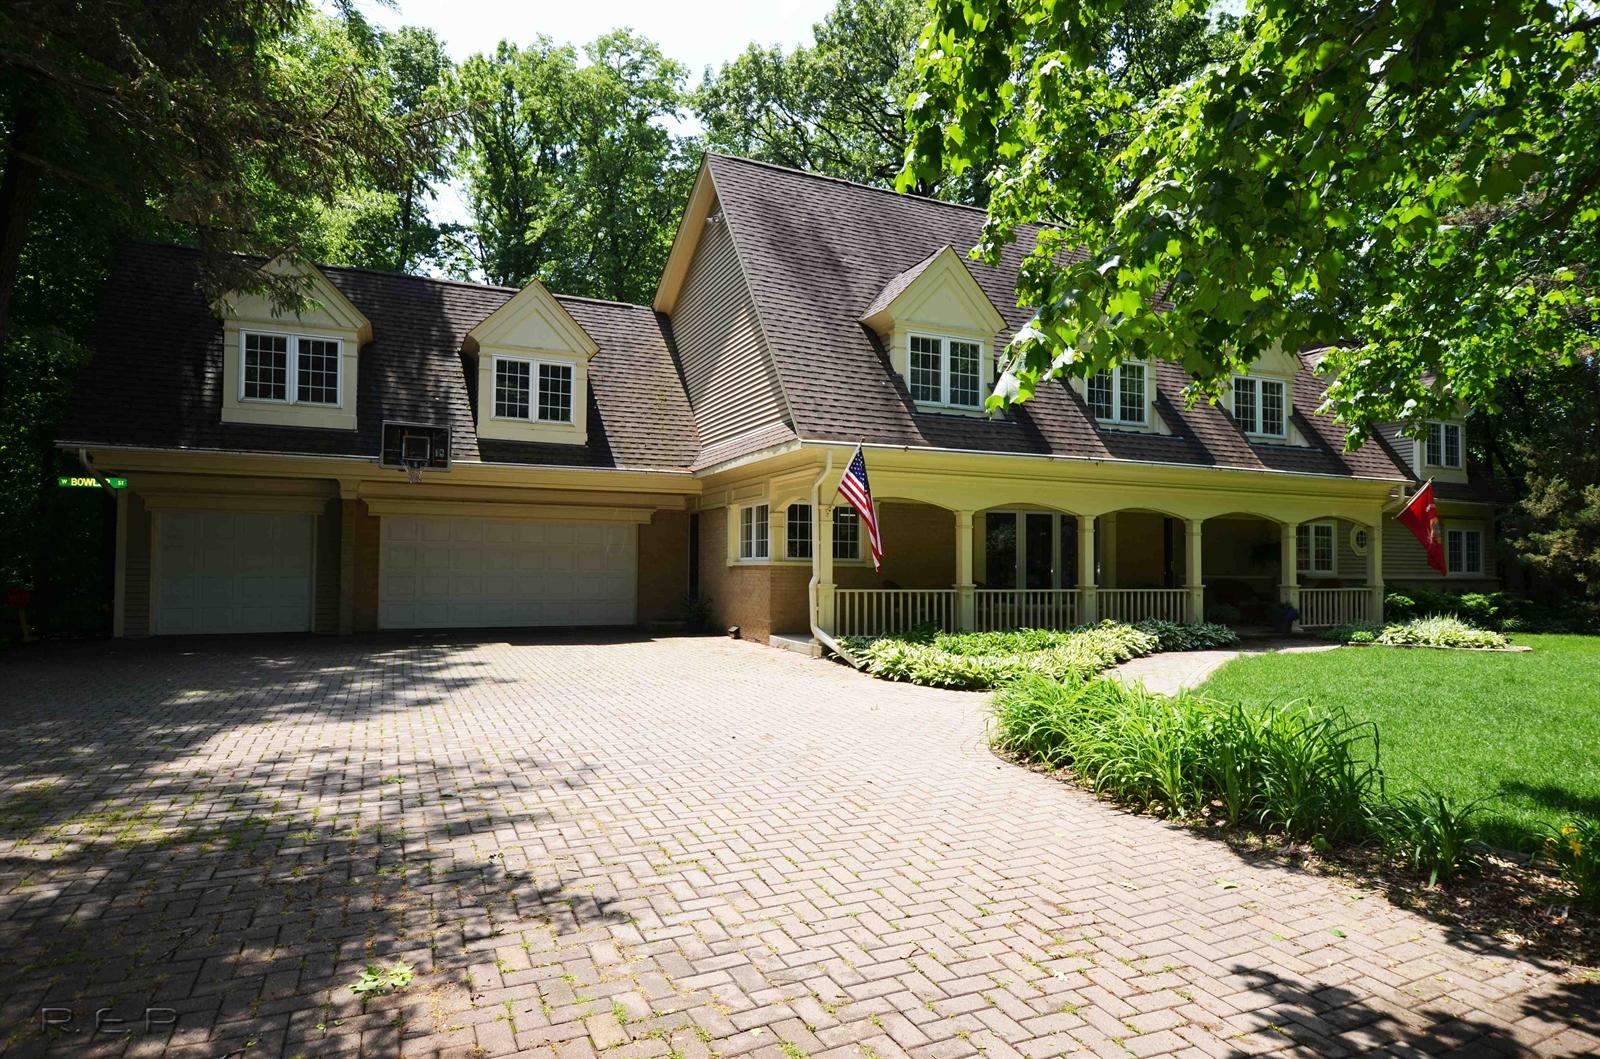 Real Estate Photography - 620 E Gartner Rd, Naperville, IL, 60540 -